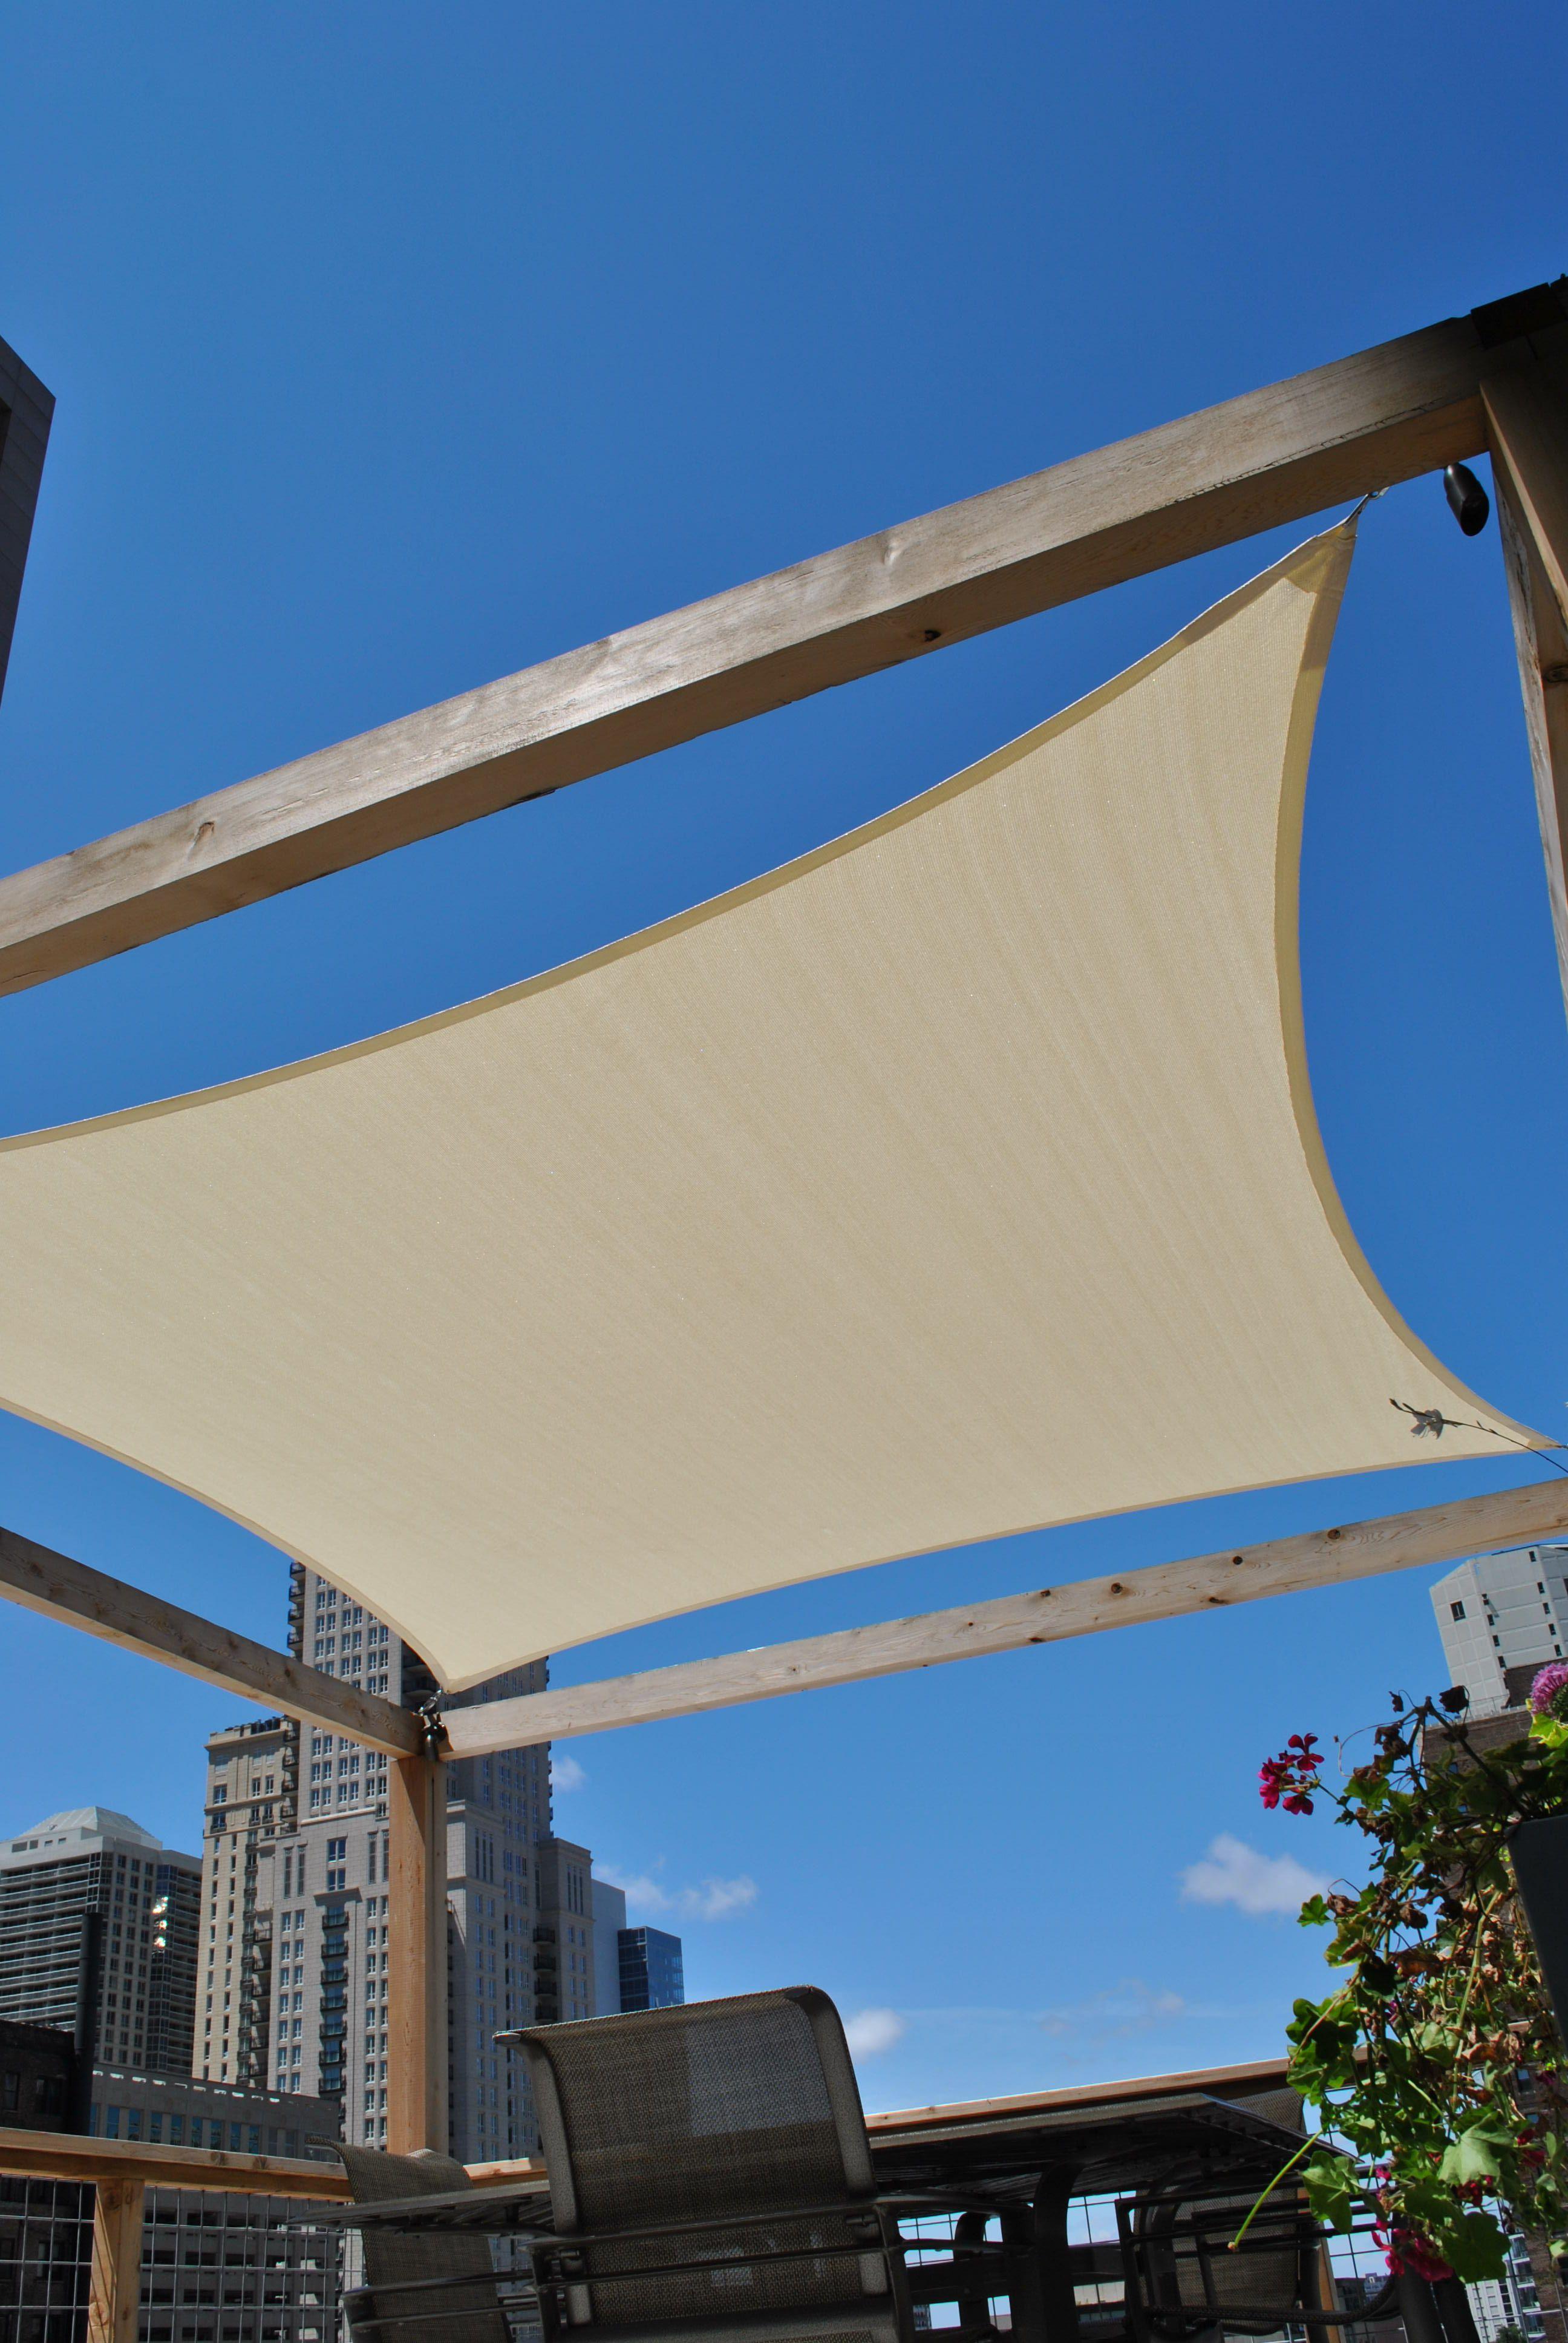 Roof Deck Pergola Shade Sail Urban Landscape Garden Design